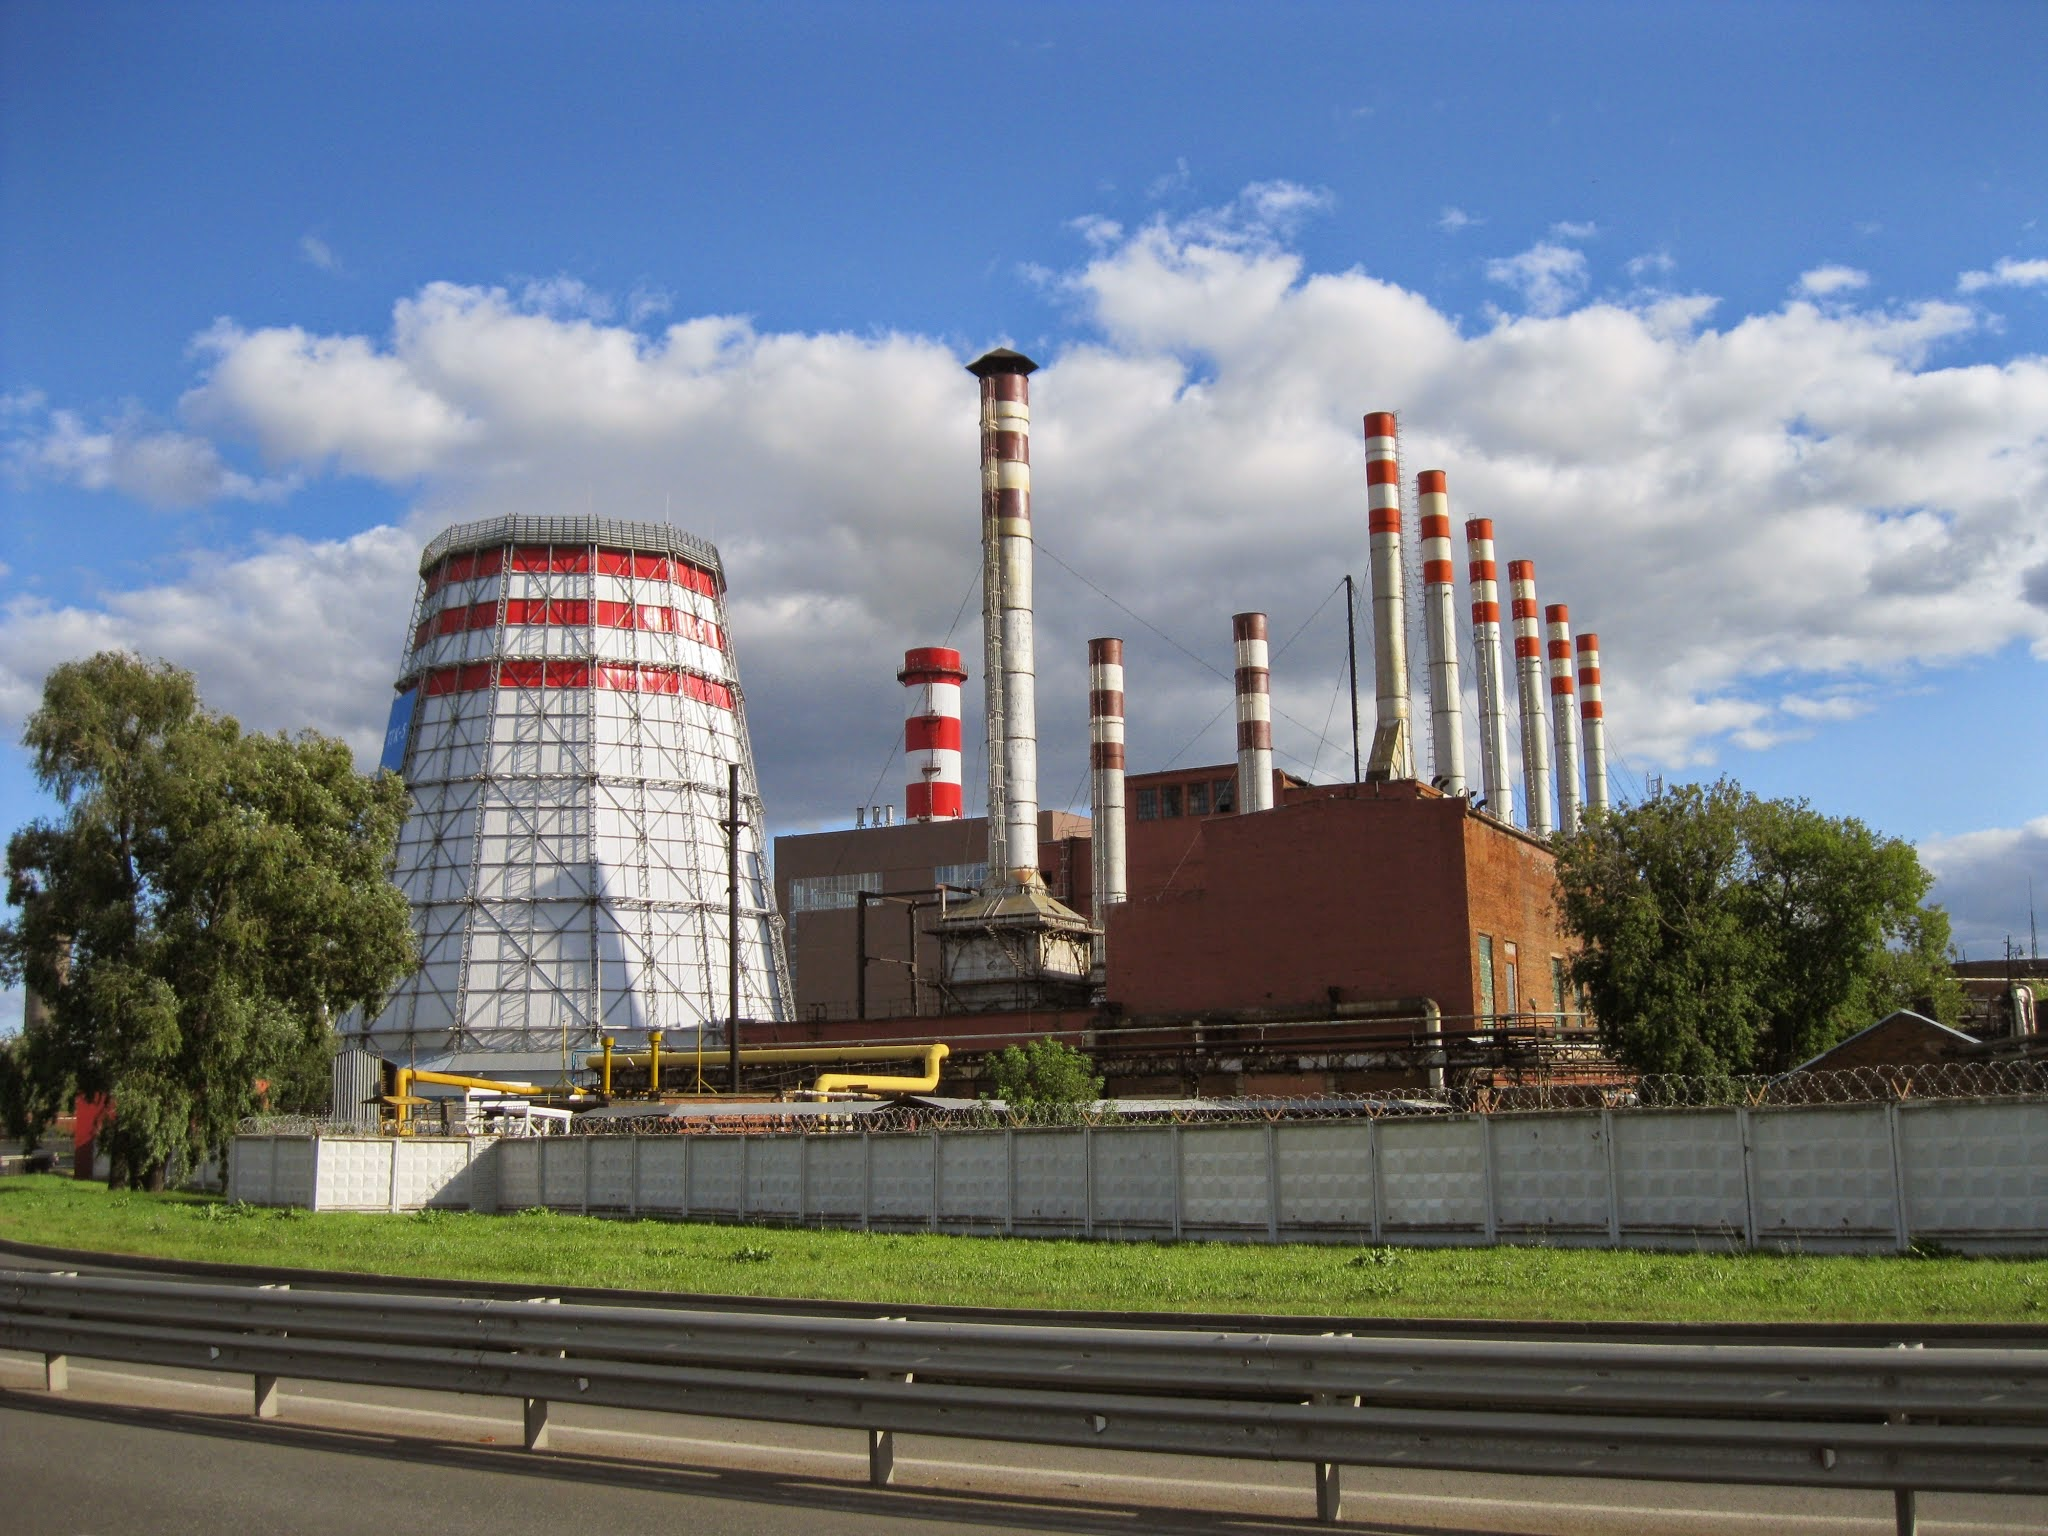 File Izhevsk thermal electric power plant 1 JPG Wikimedia mons